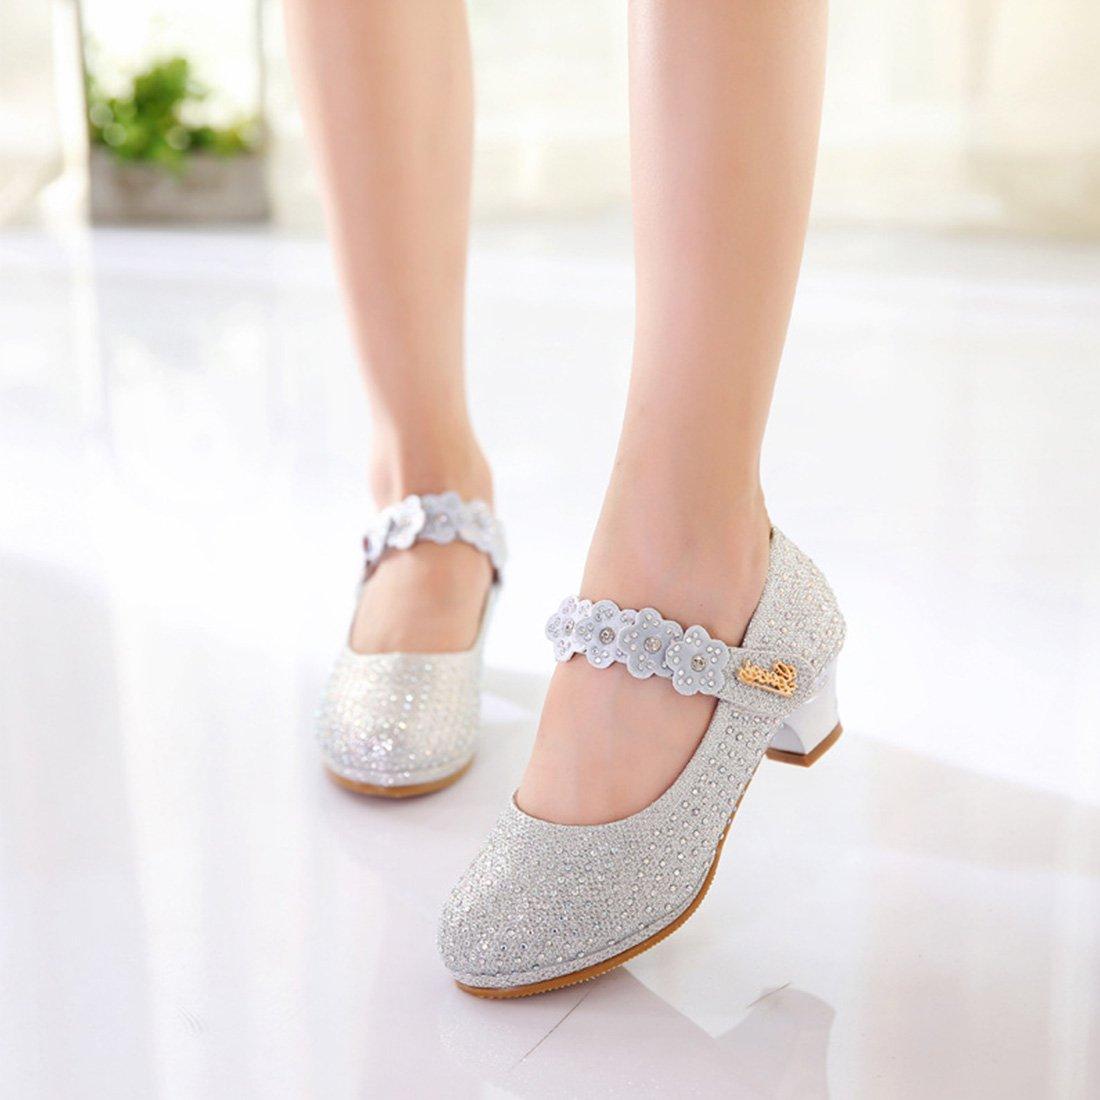 YIBLBOX Little girls Princess Dress Shoe Low Heel Wedding Party Dance Shoes Mary Jane